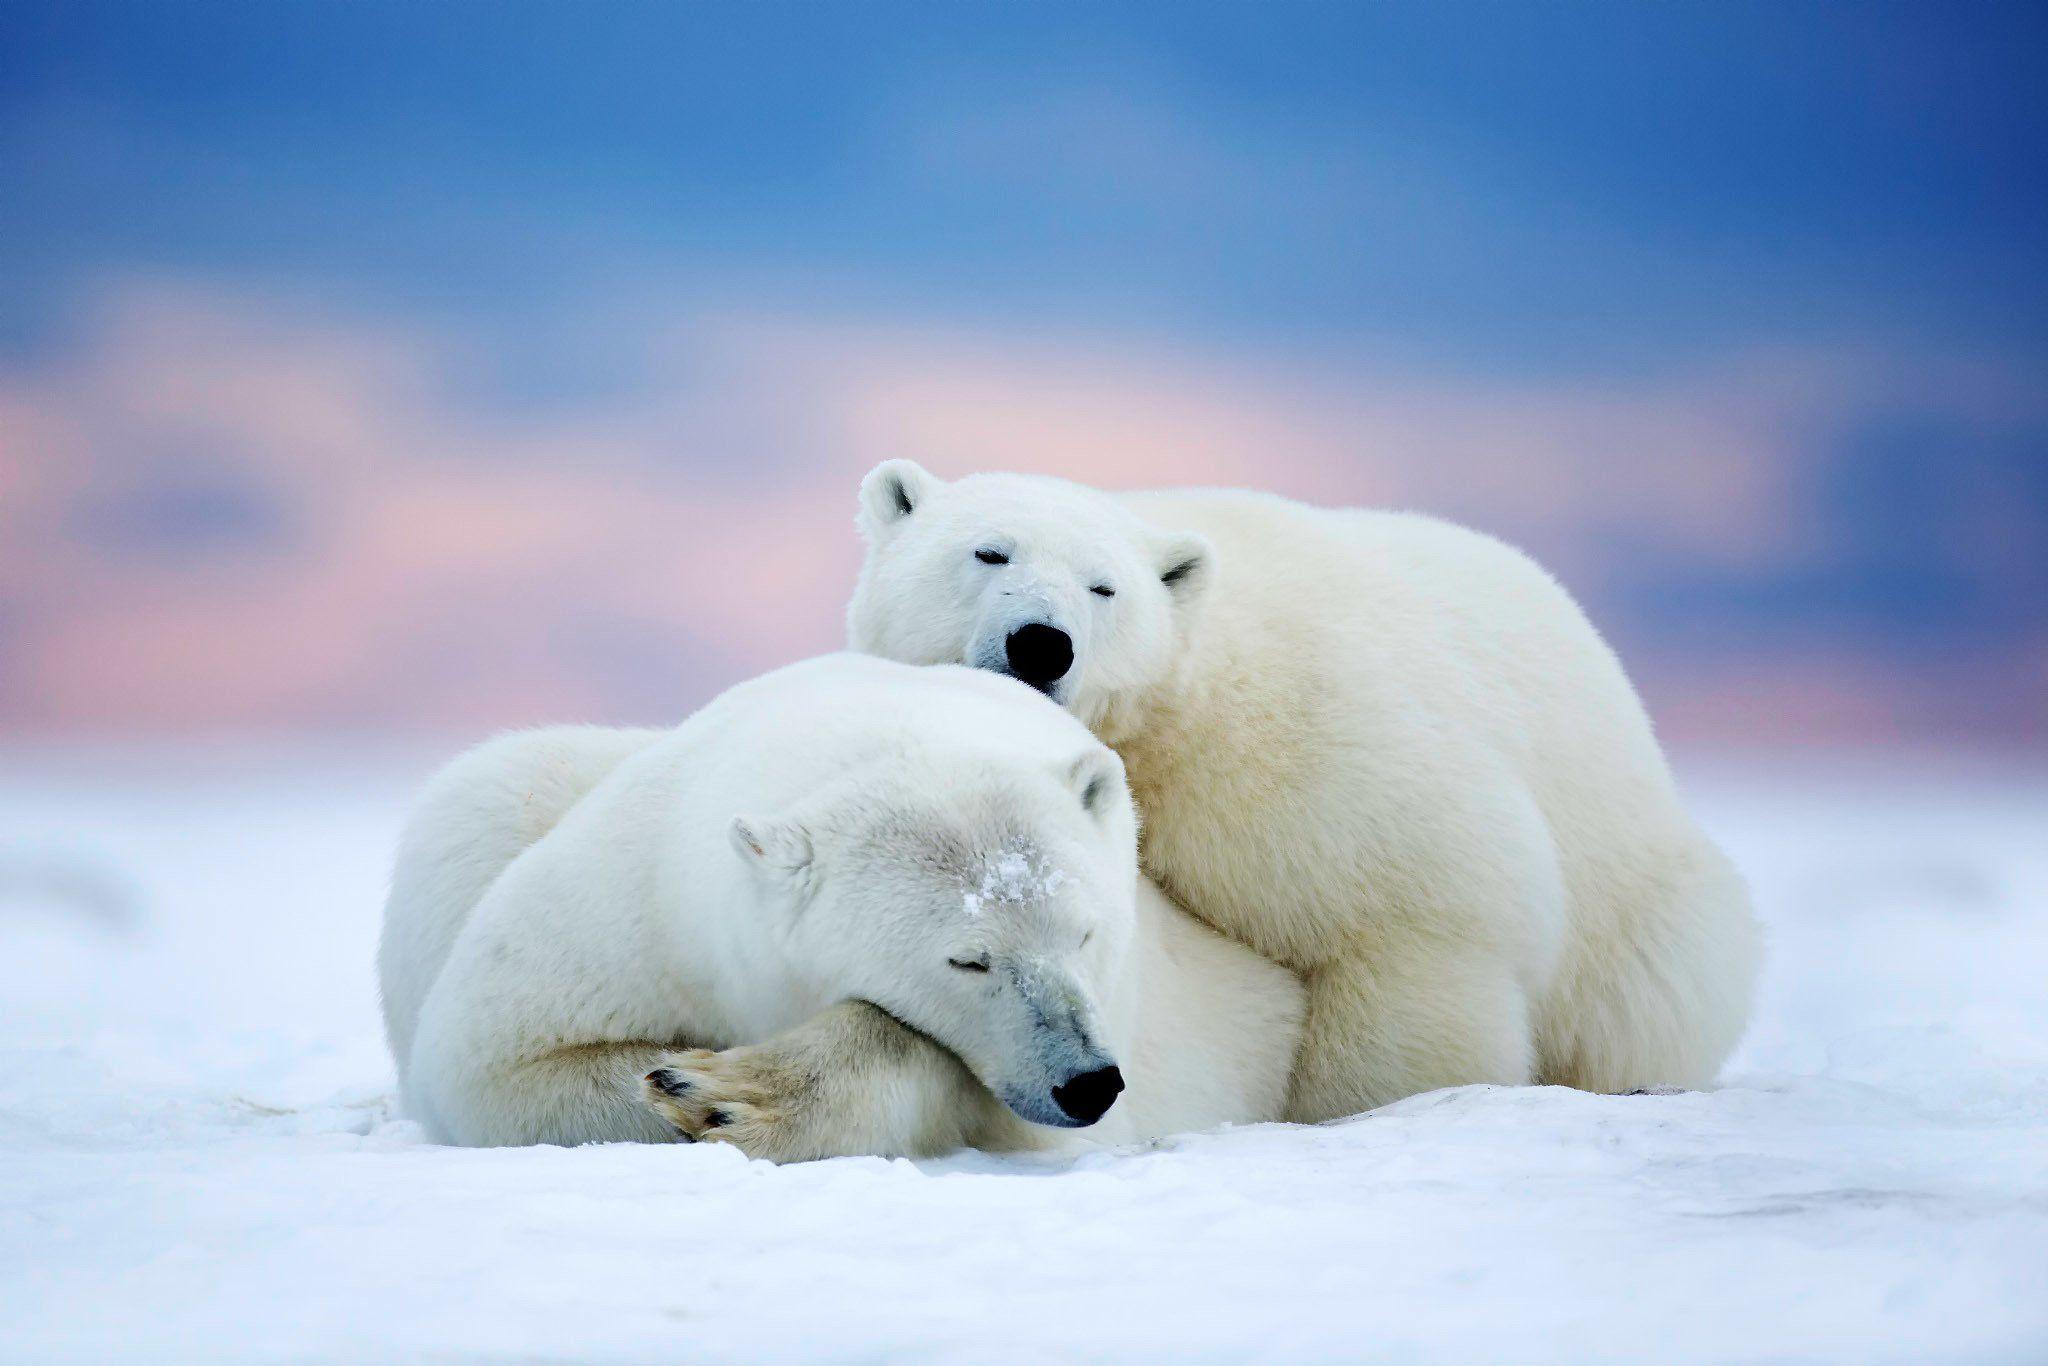 Polar Bears Two Sleeping Snow Sky Winter Animals Bear Wallpaper 2048x1366 588609 Cute Polar Bear Polar Bear Wallpaper Bear Stuffed Animal